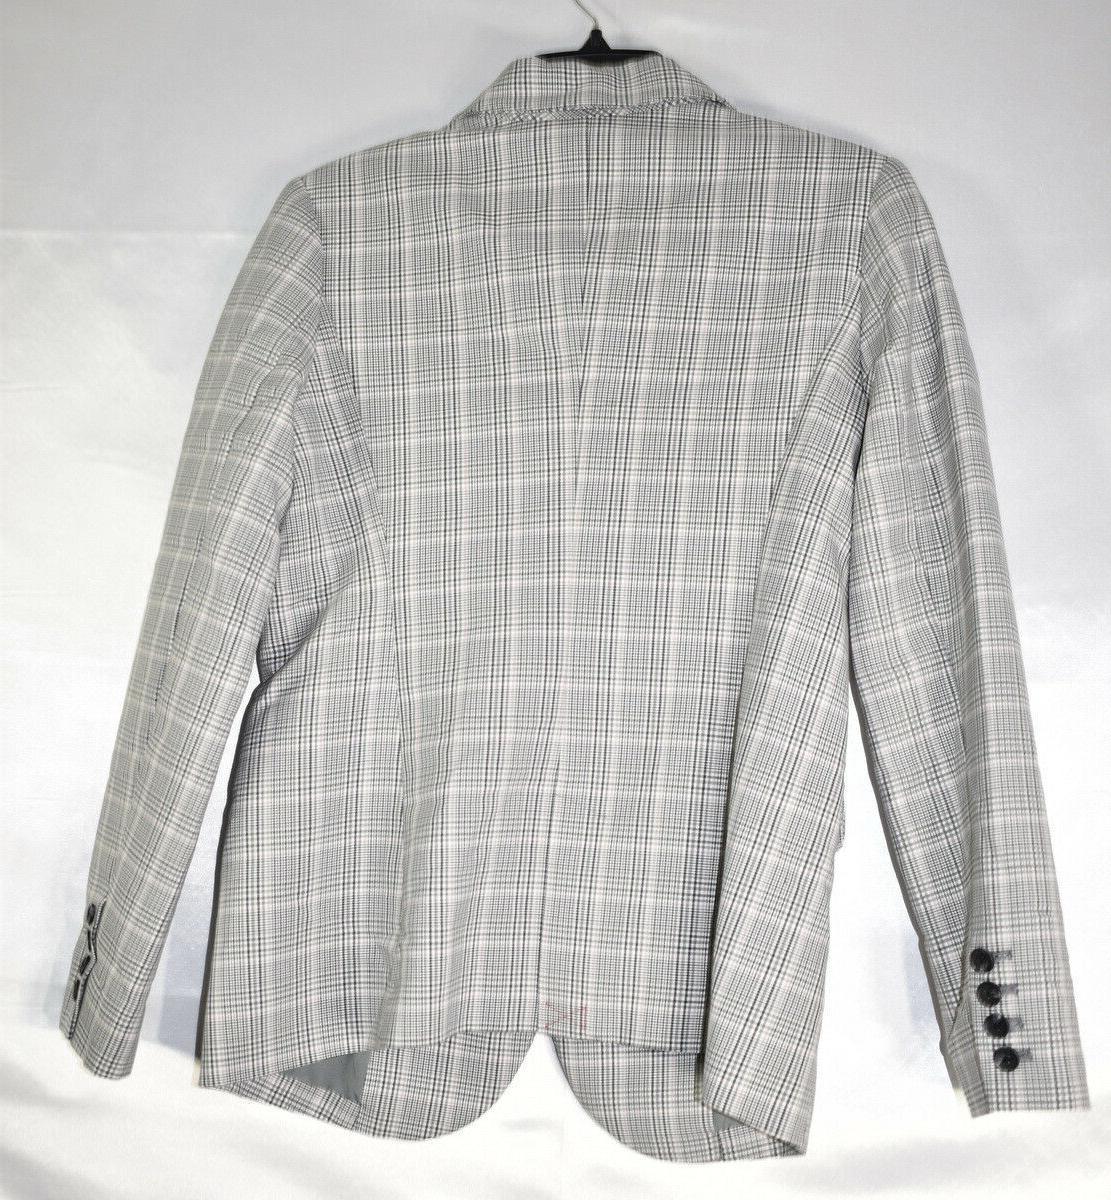 A Plaid Suit Jacket, Gray, M, NwT